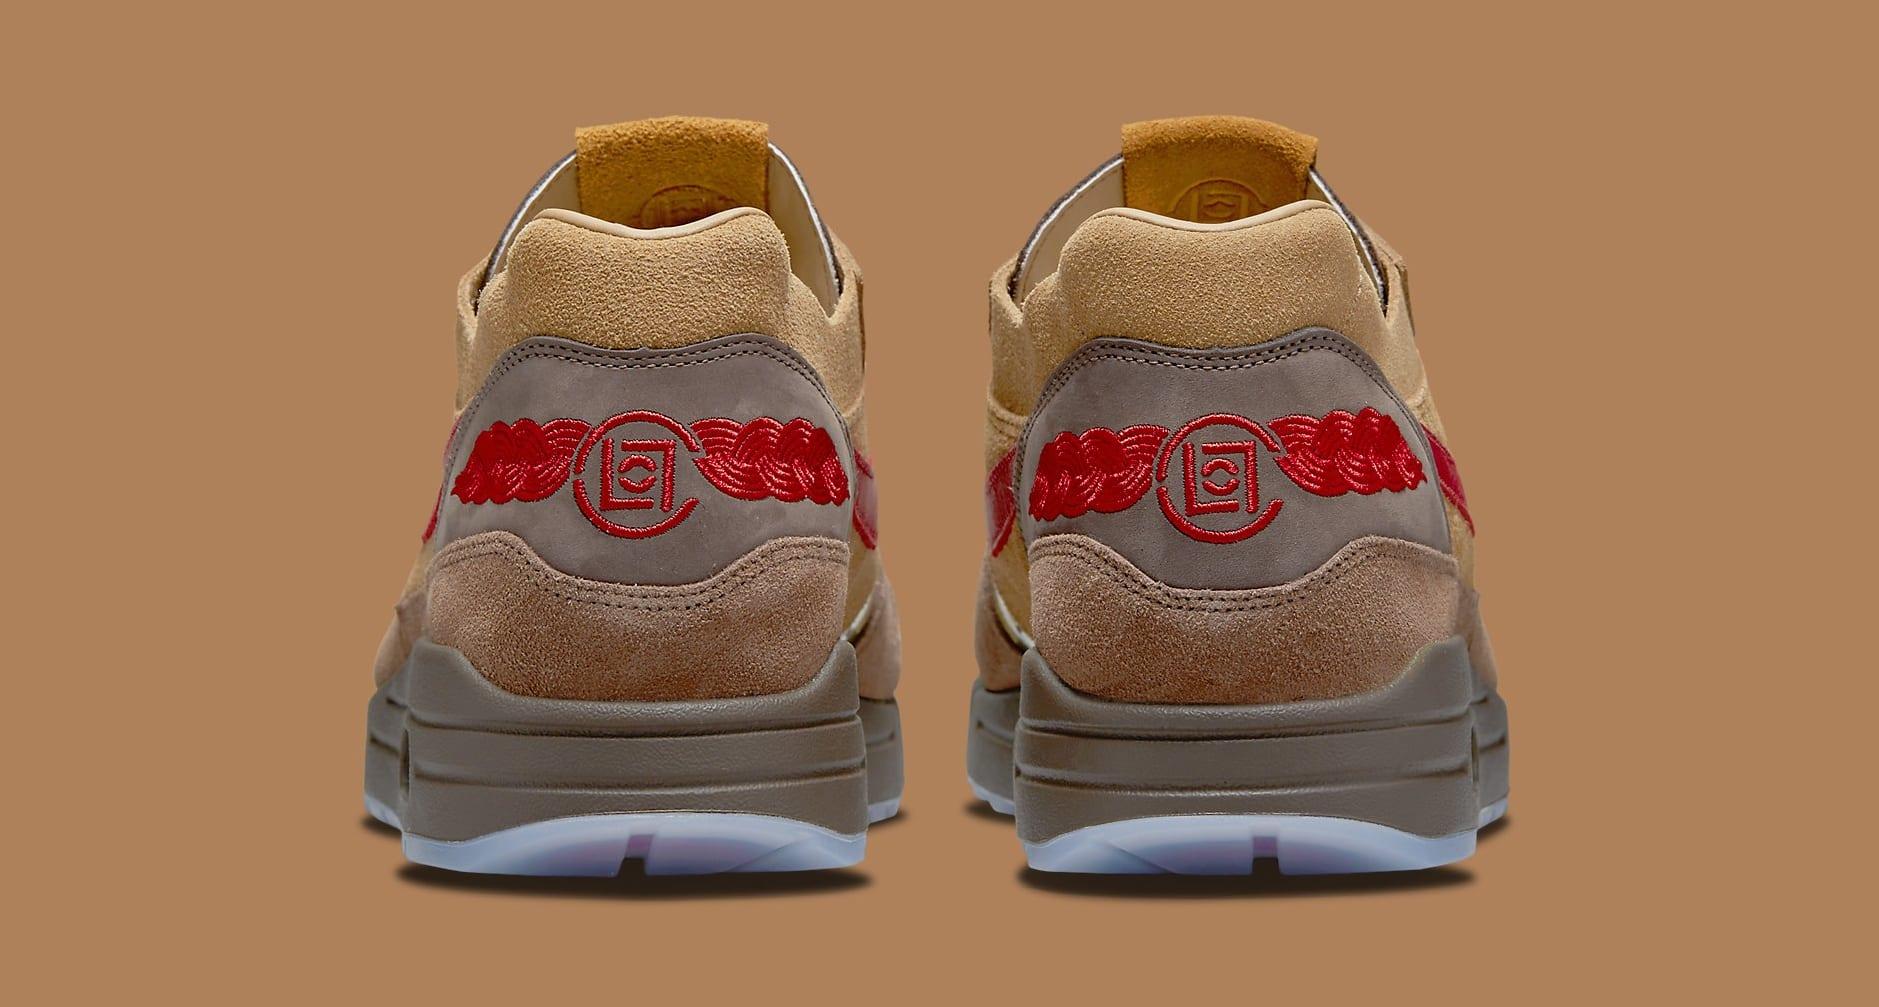 Clot x Nike Air Max 1 'K.O.D. - CHA' DD1870-200 Heel